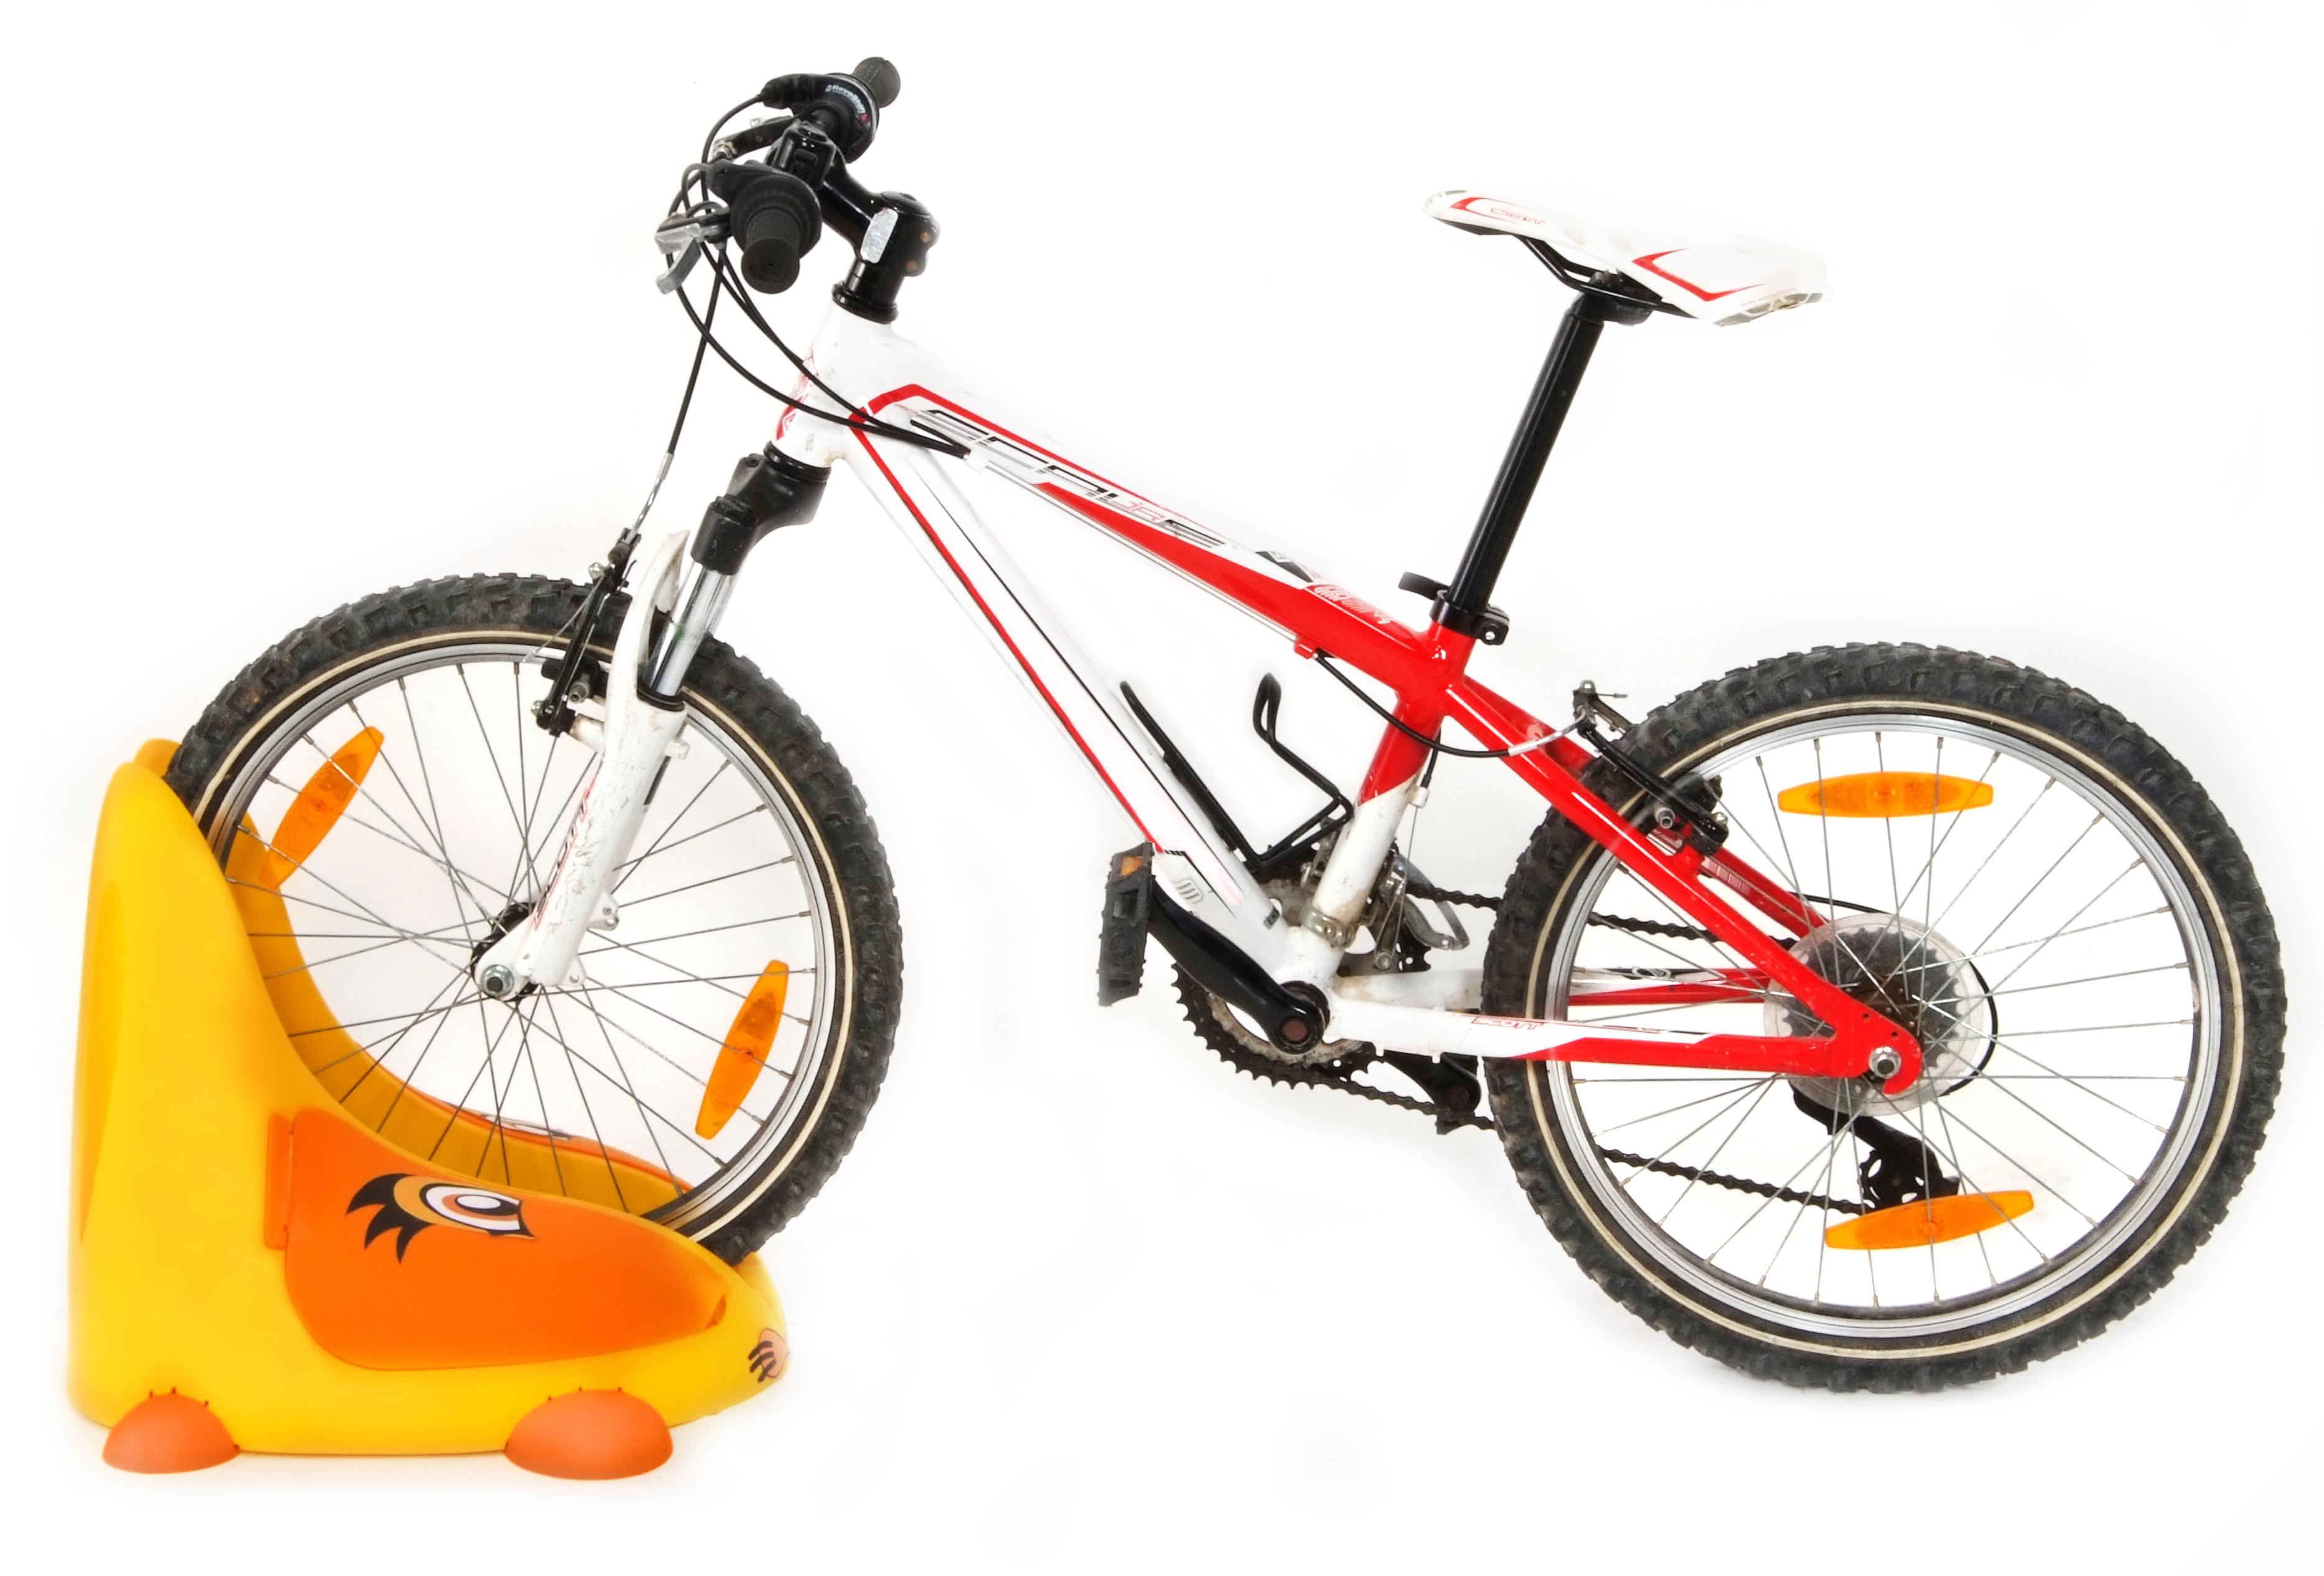 LEO-Bike